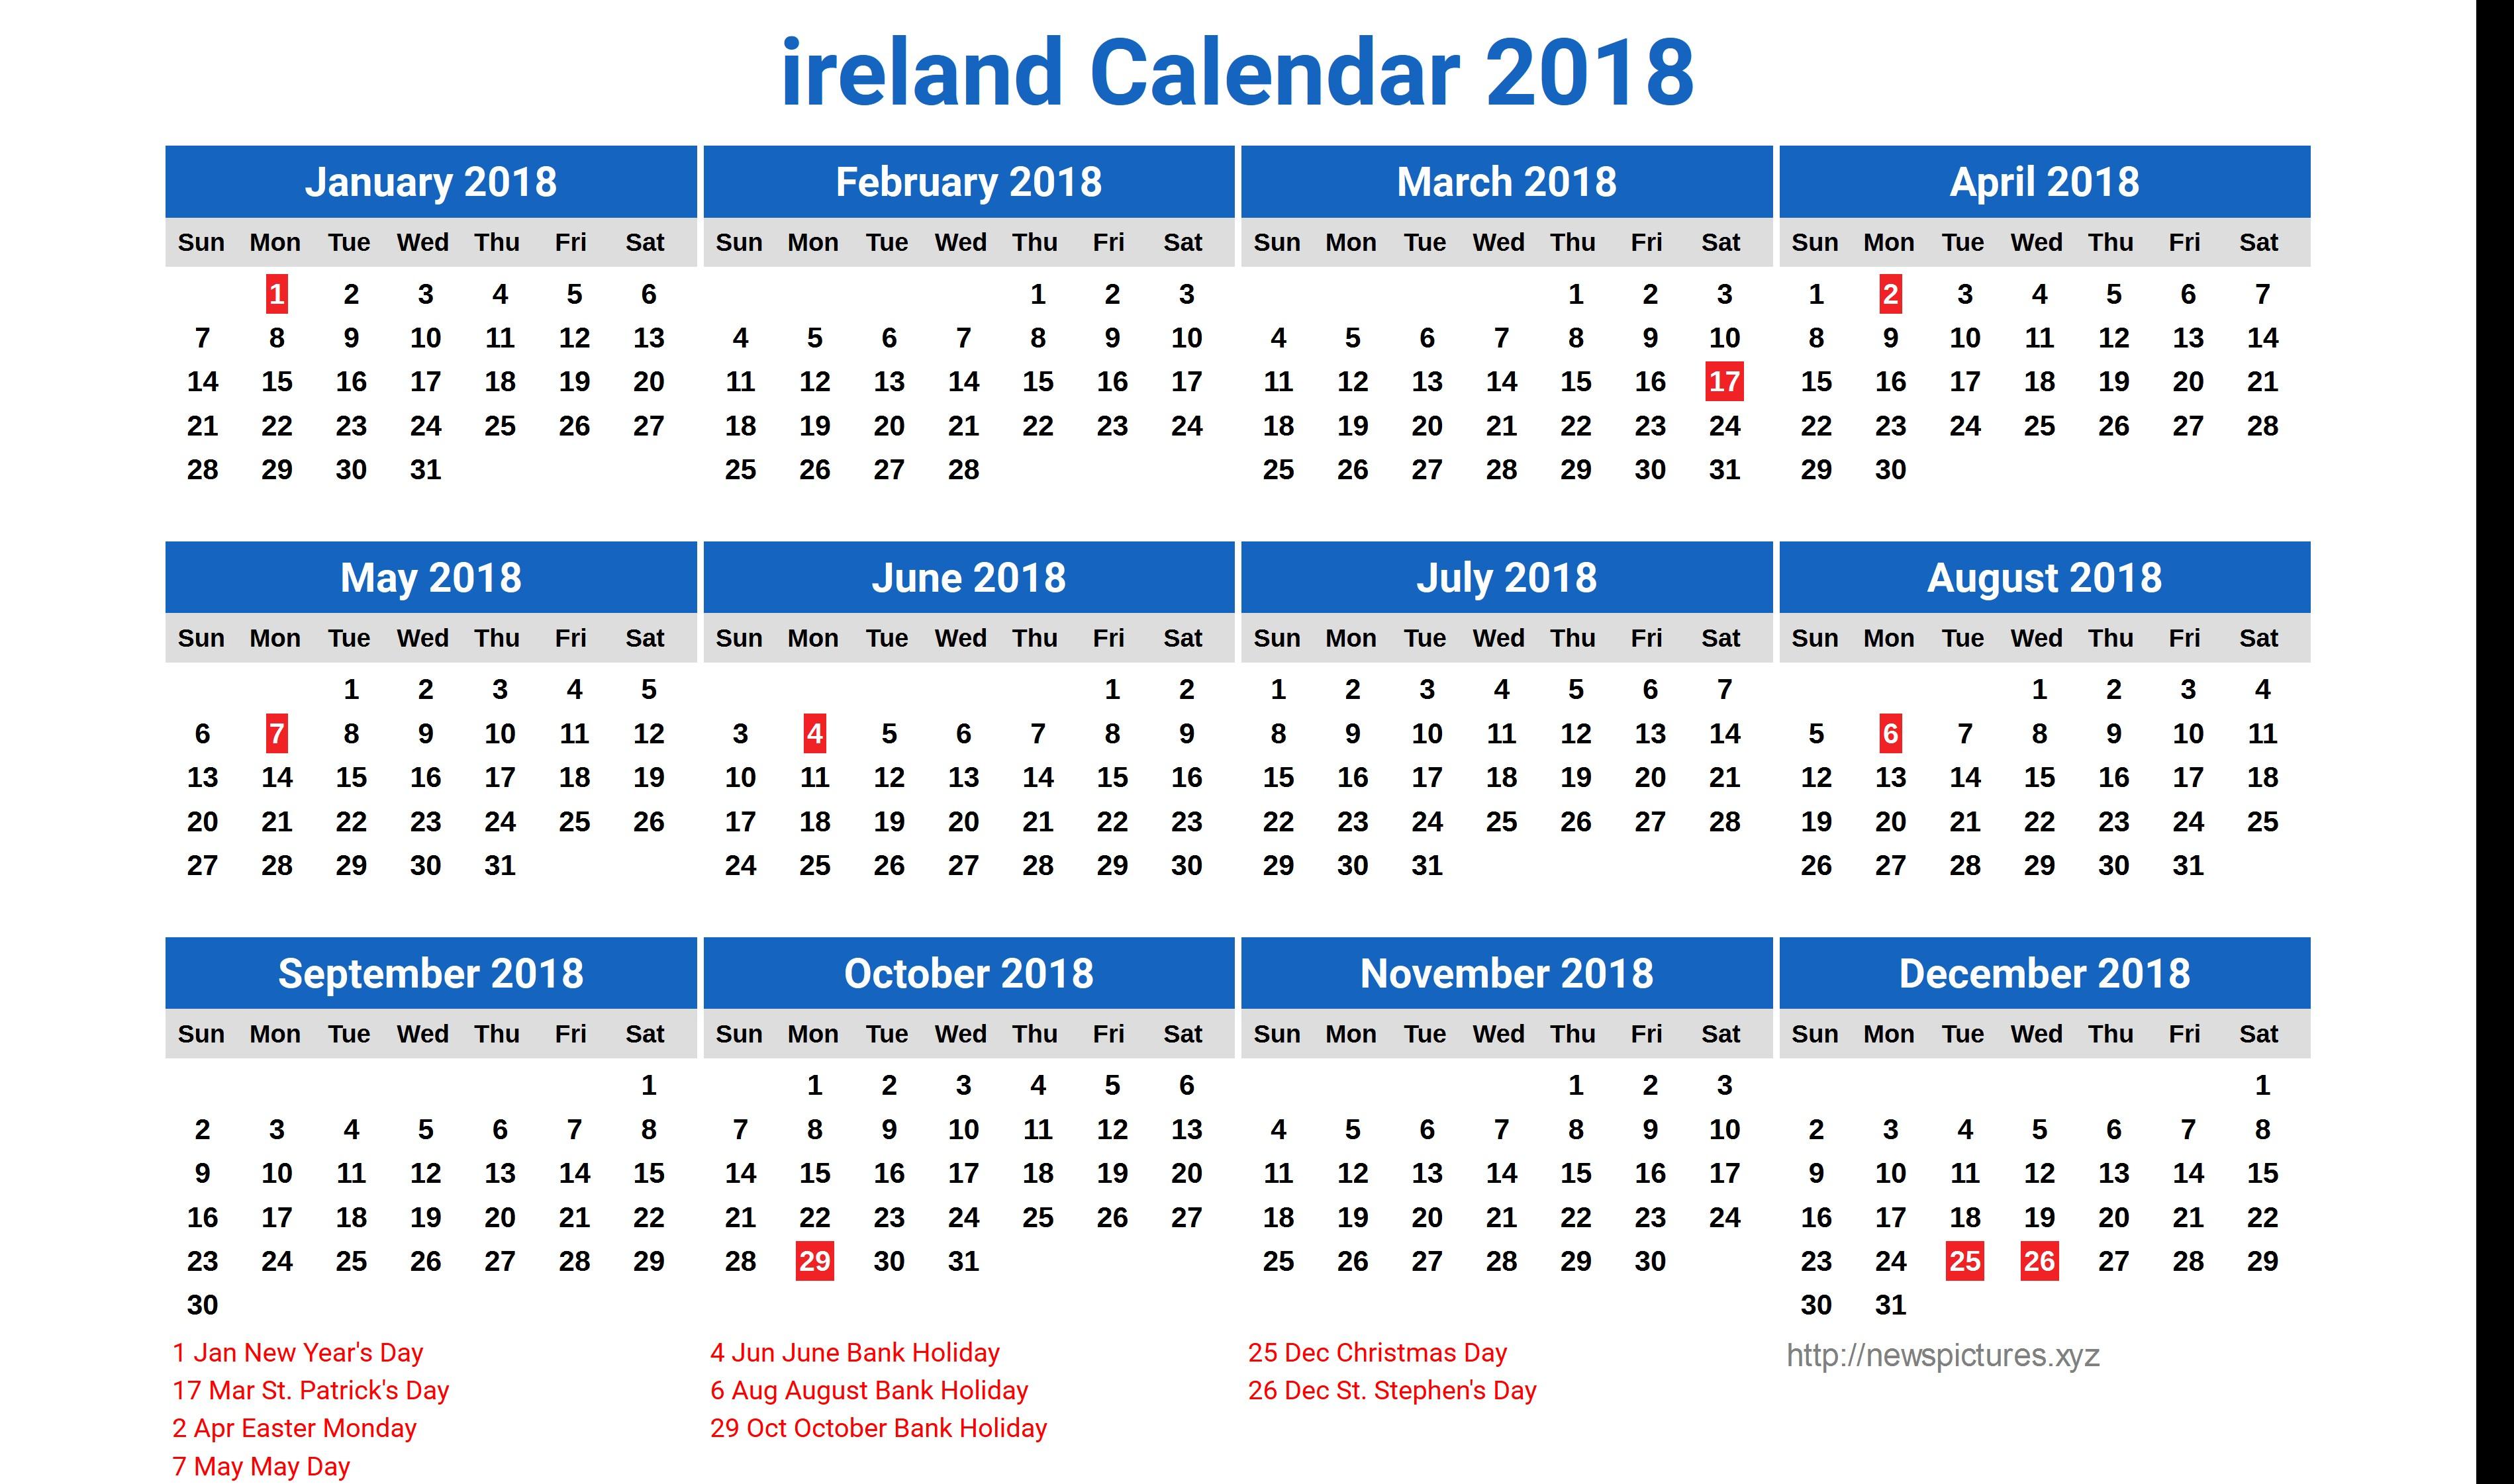 november 2018 calendar easter holiday calendar ireland 2018 of holiday calendar ireland 2018awesome luxury elegant best of beautiful fresh inspirational lovely unique new ireland calendar 2018 1 newspictures MjmAOv